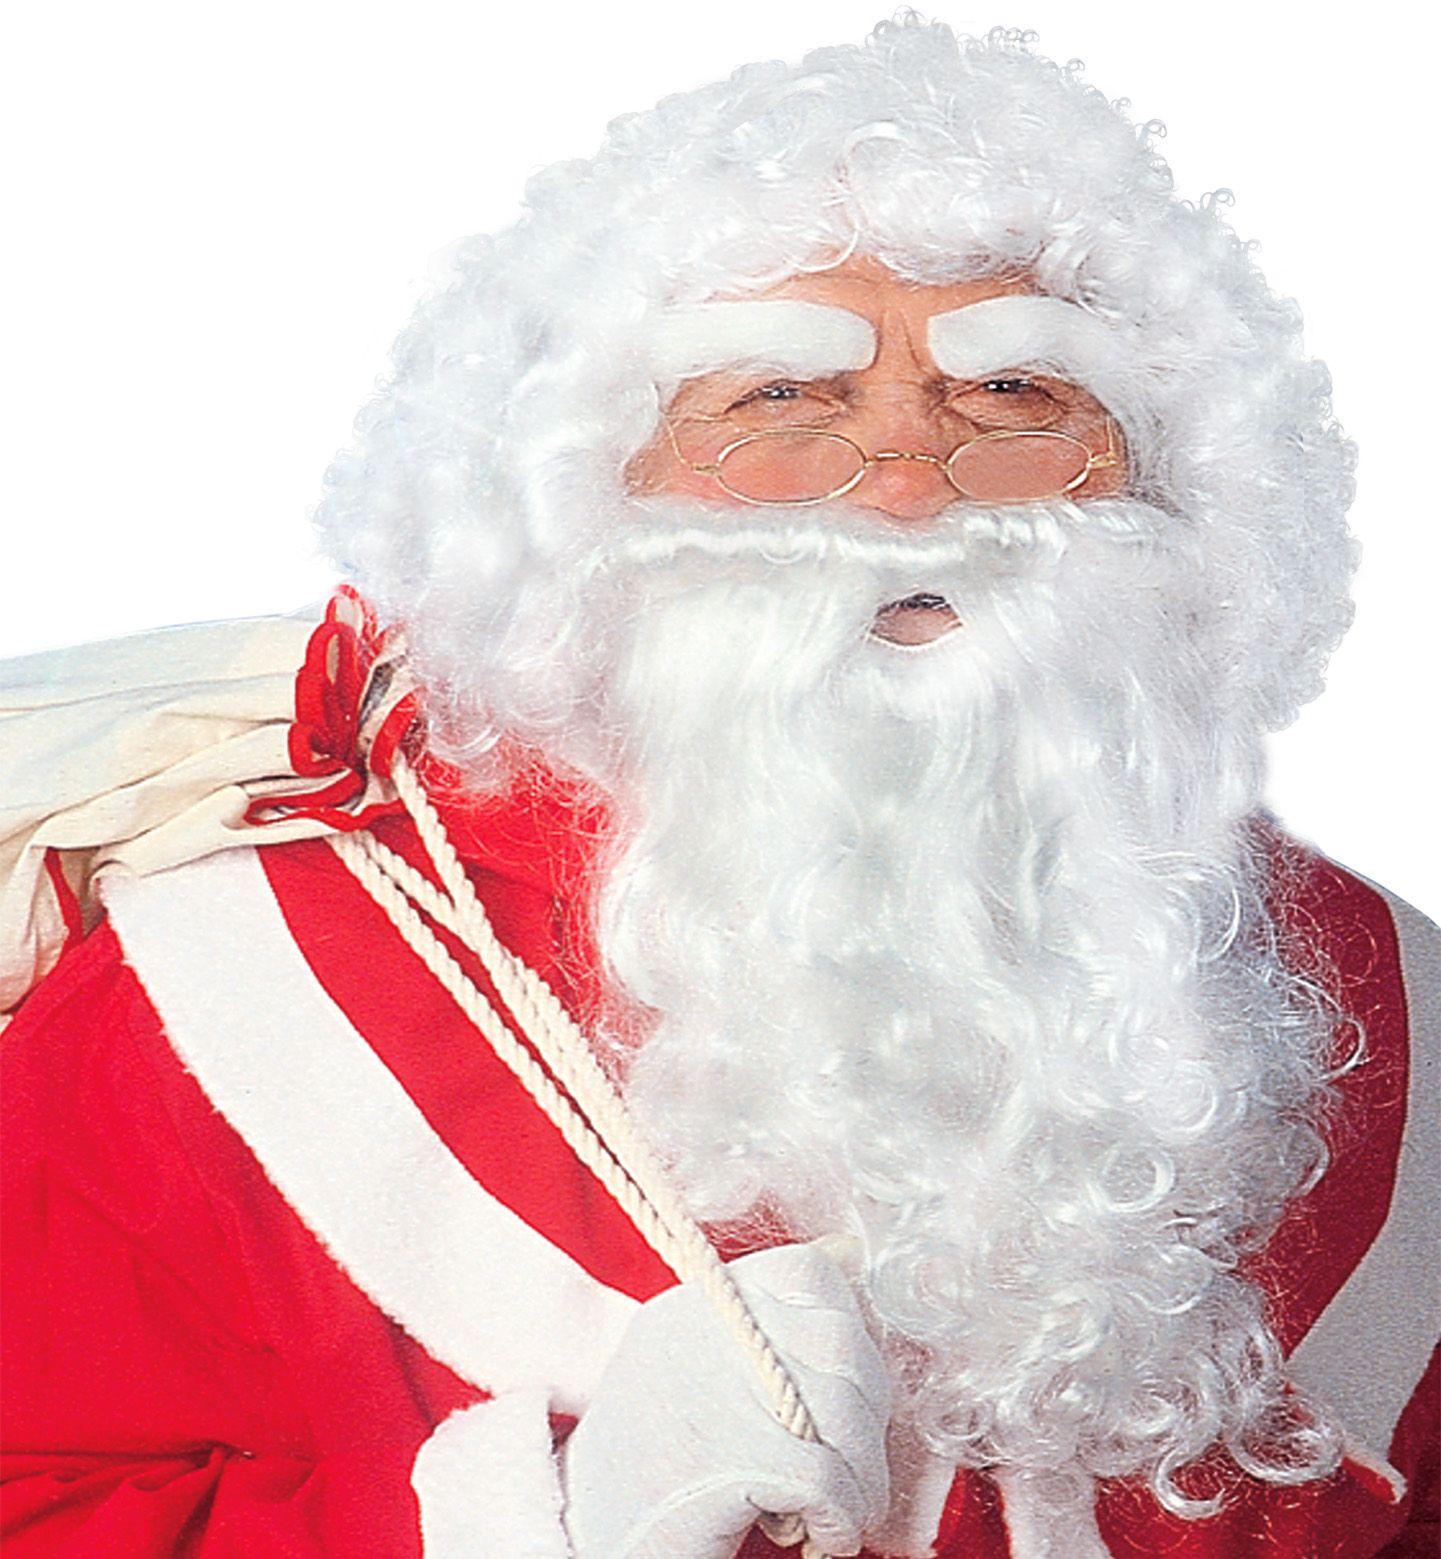 Witte luxe kerstman pruik met baard en wenkbrauwen